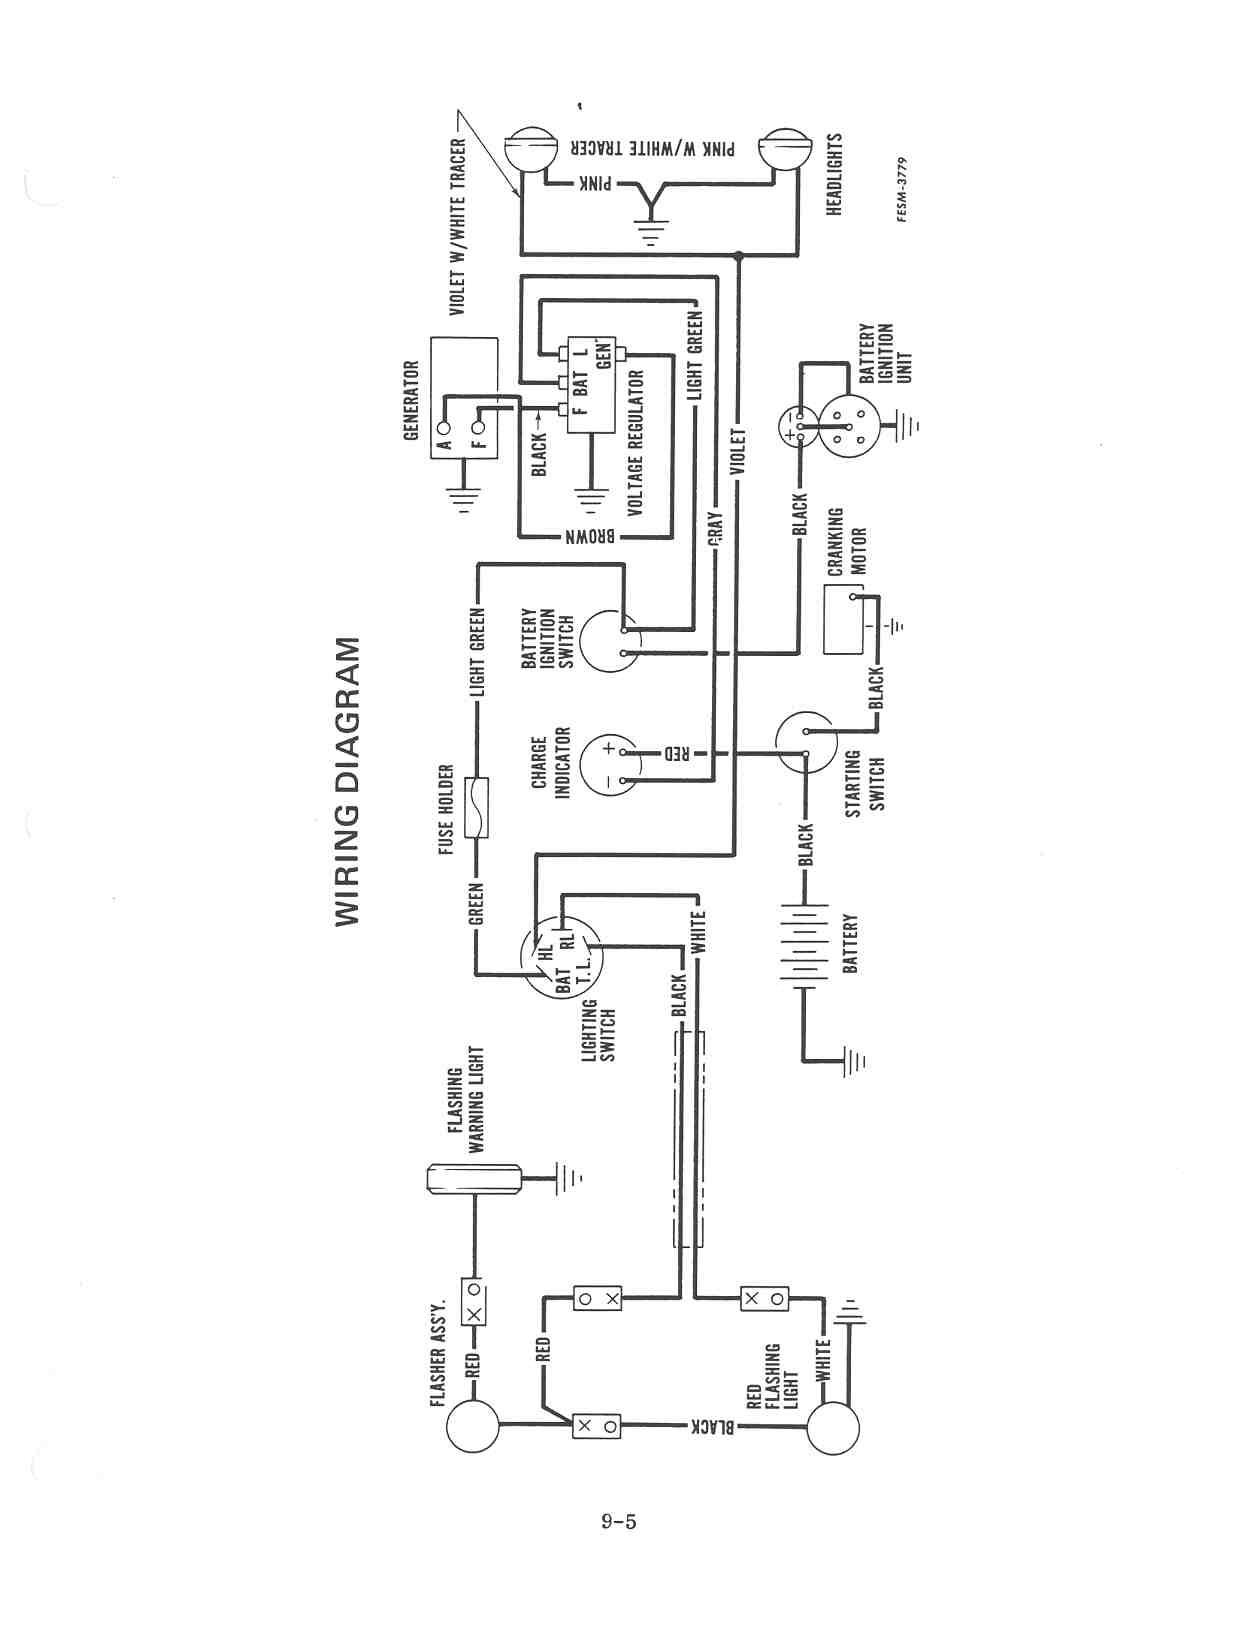 1948 farmall h wiring diagram ms 4109  farmall model a parts diagram free download wiring  farmall model a parts diagram free